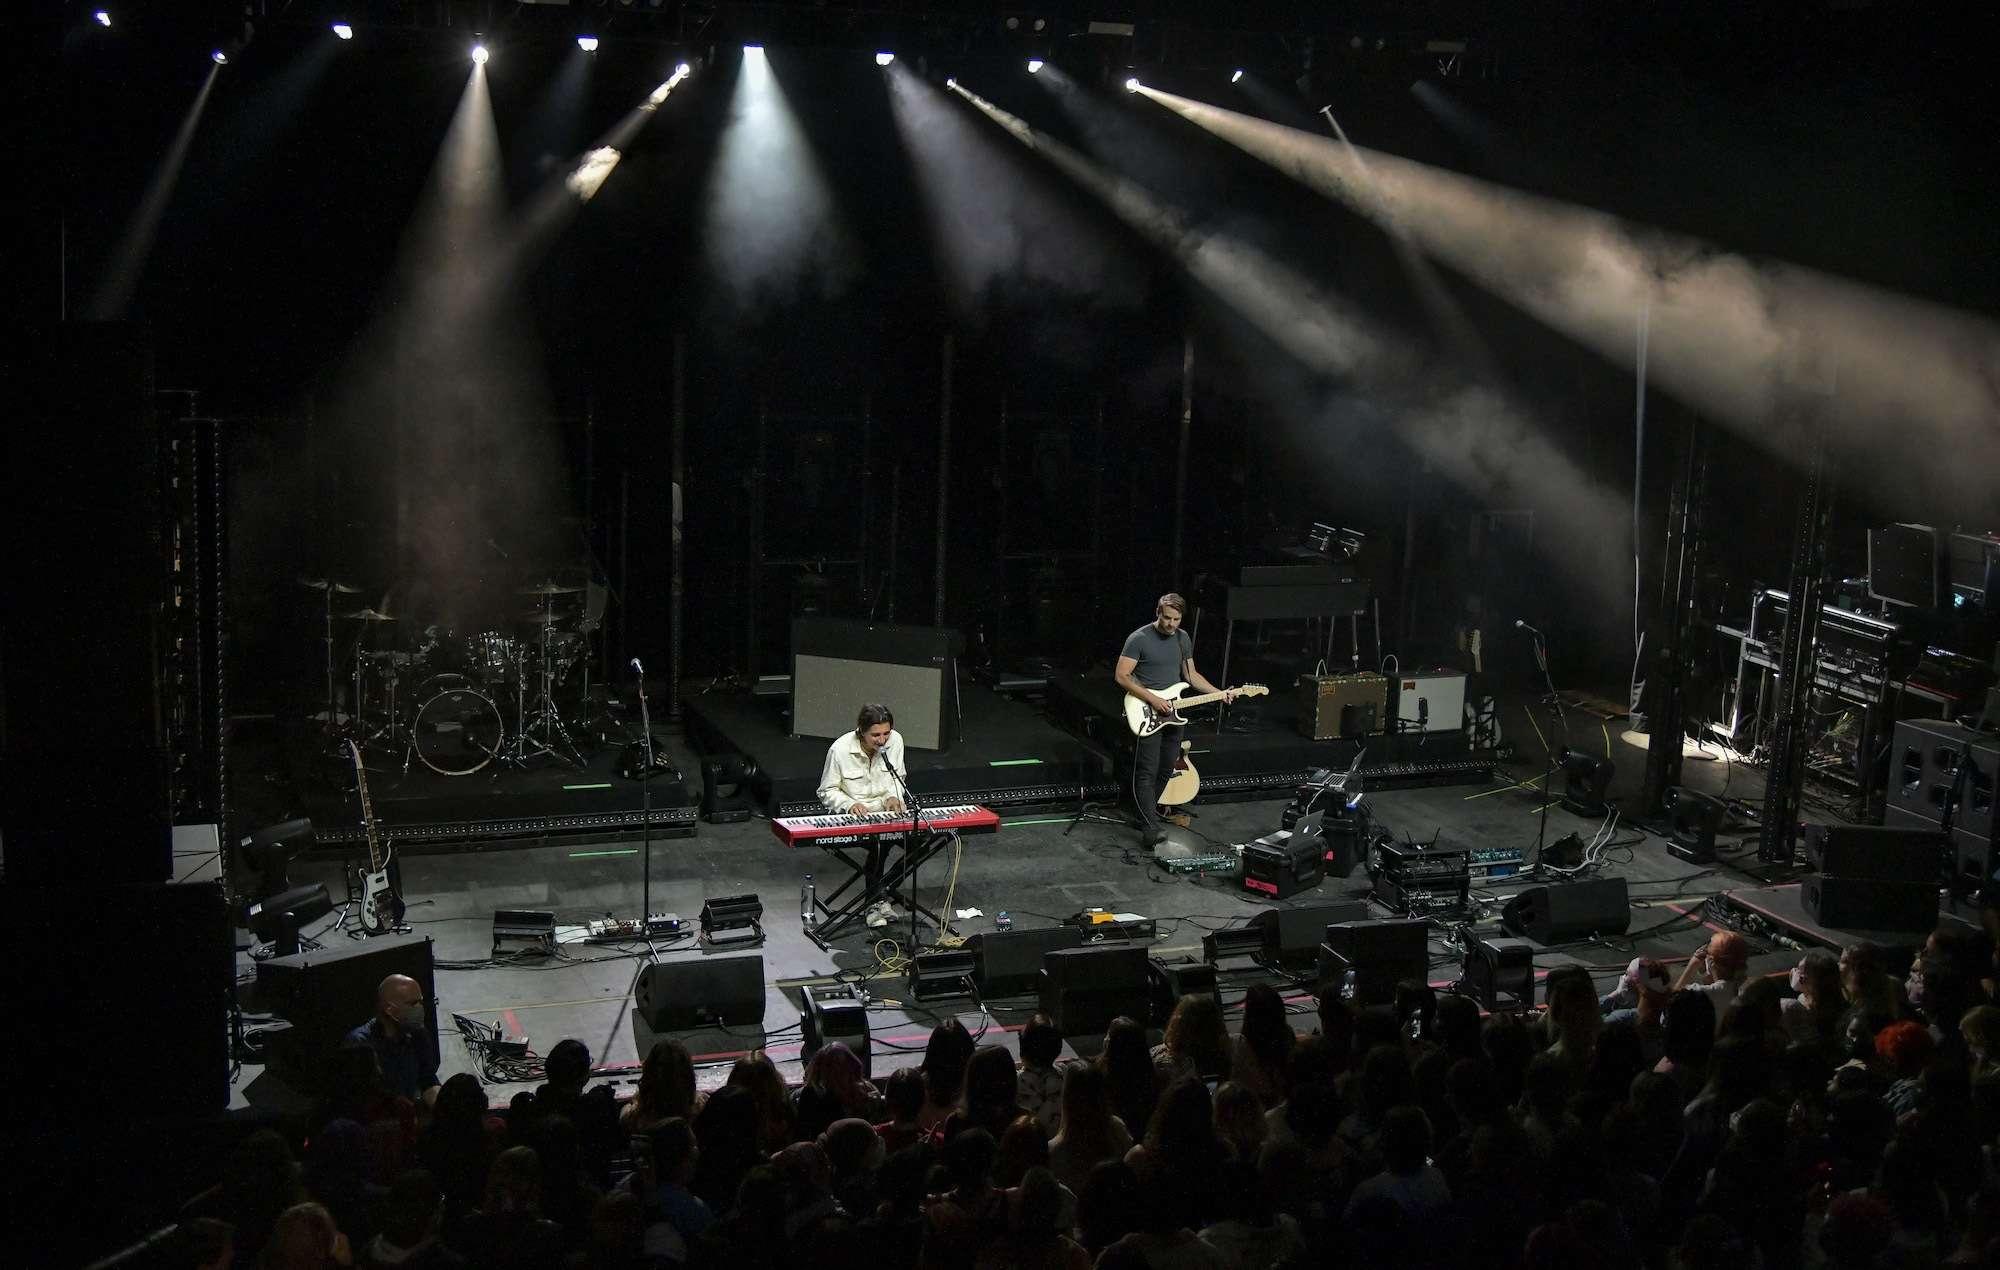 Anson Seabra Live at Riviera [GALLERY] 8